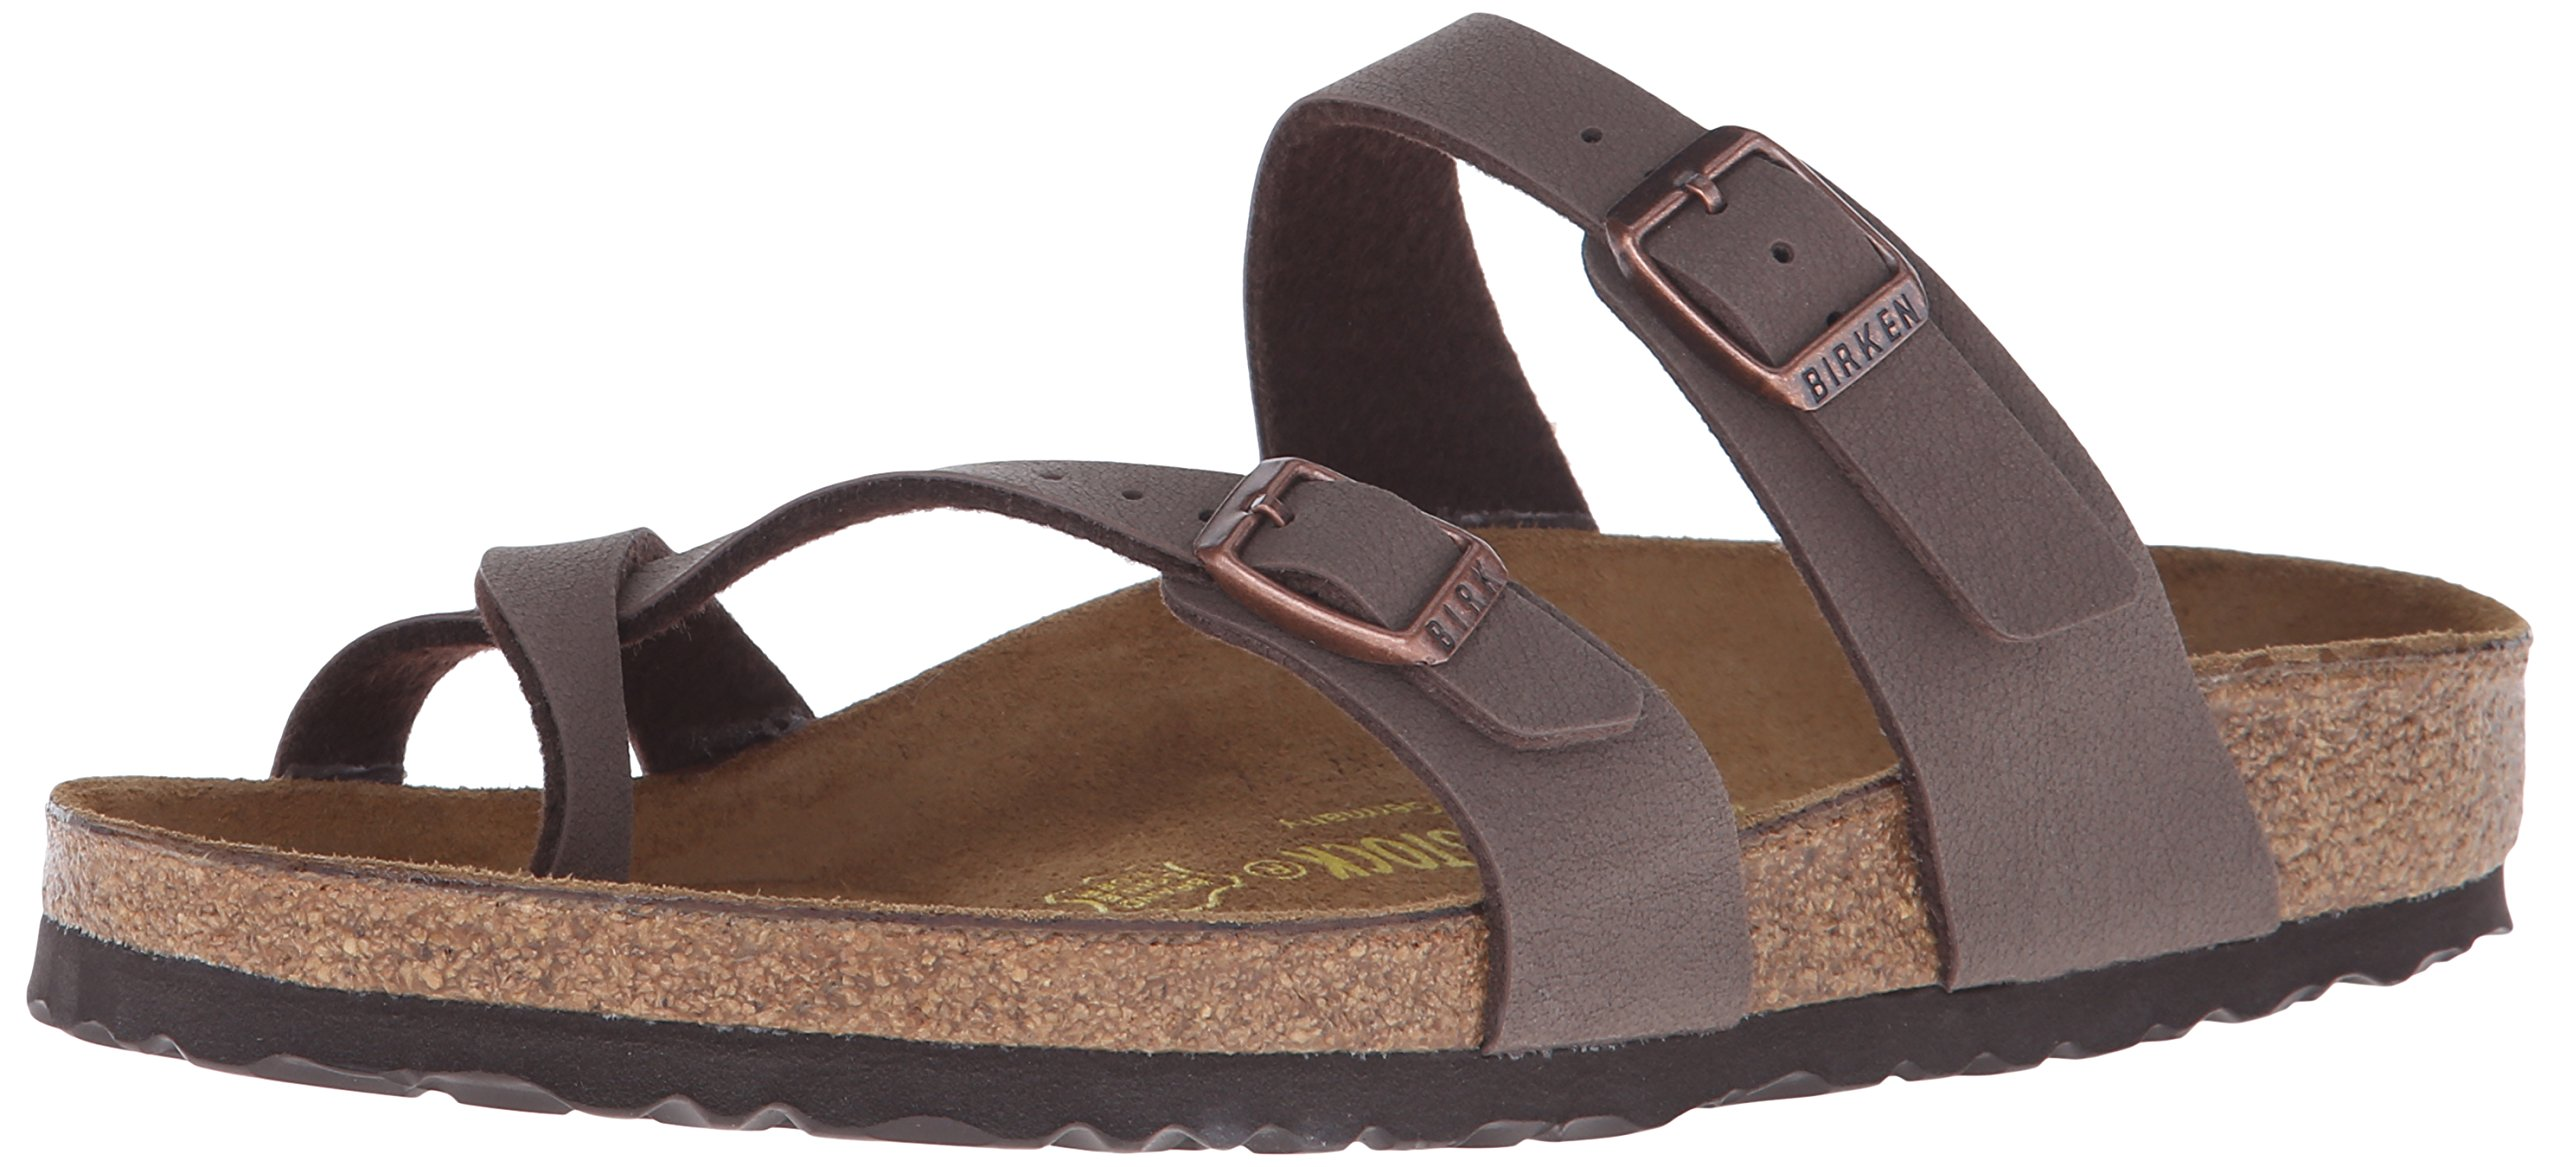 Birkenstock Women's Mayari Mocha Birkibuc Sandal 36 R (US Women's 5-5.5)